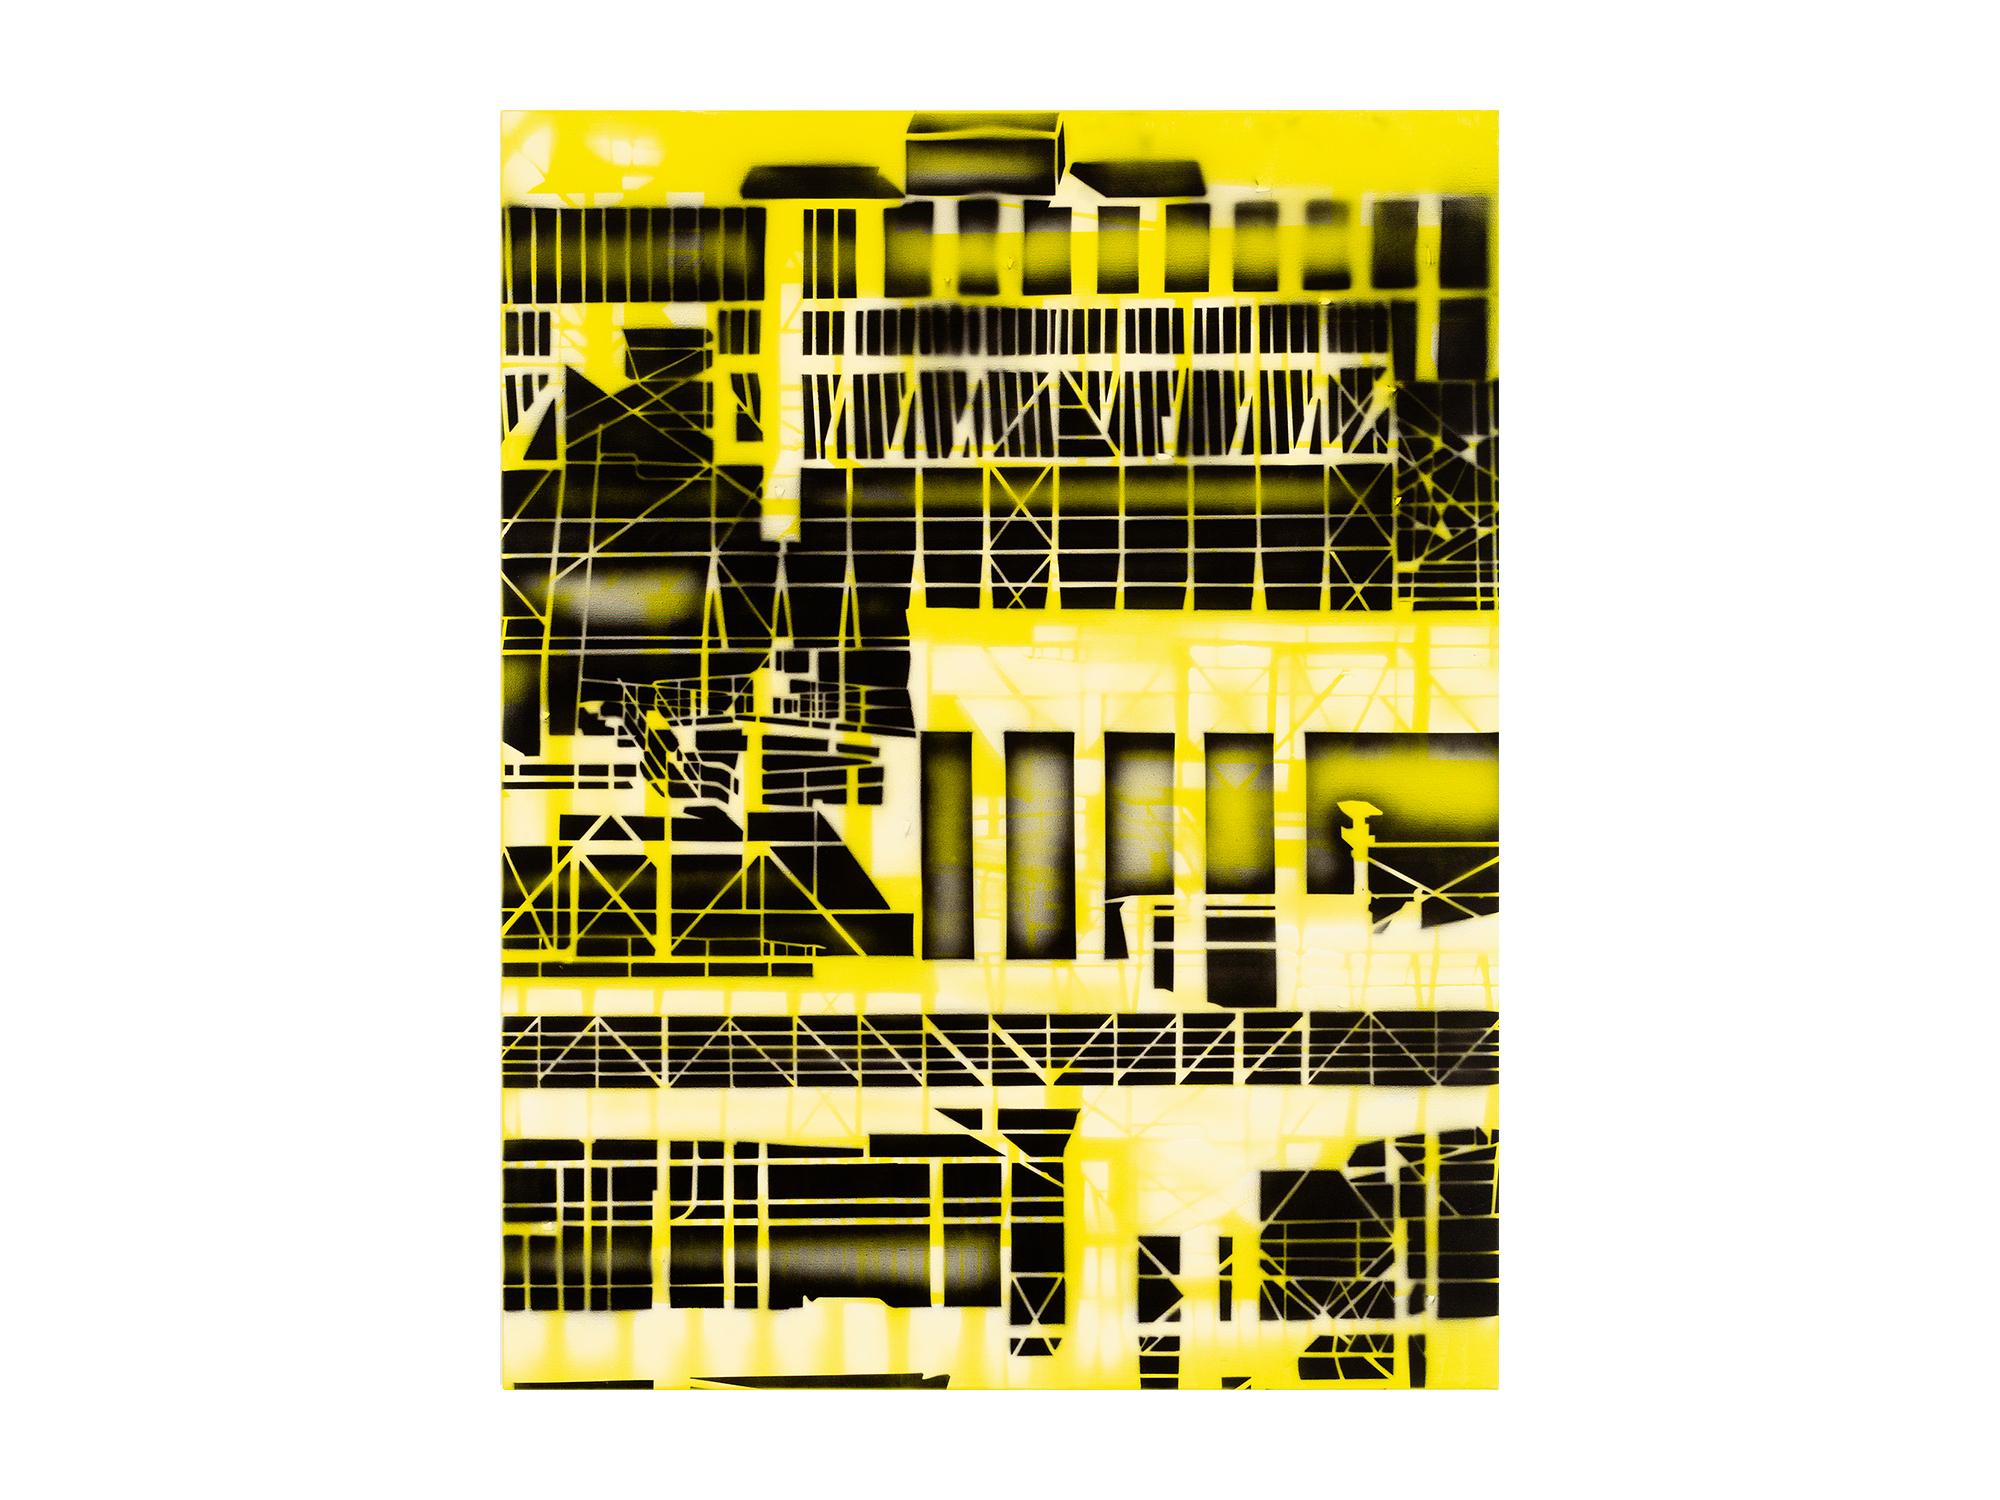 Louise Forthun   Zinc Roast ,   2018 acrylic on linen 110 x 86cm   ARTIST BIO